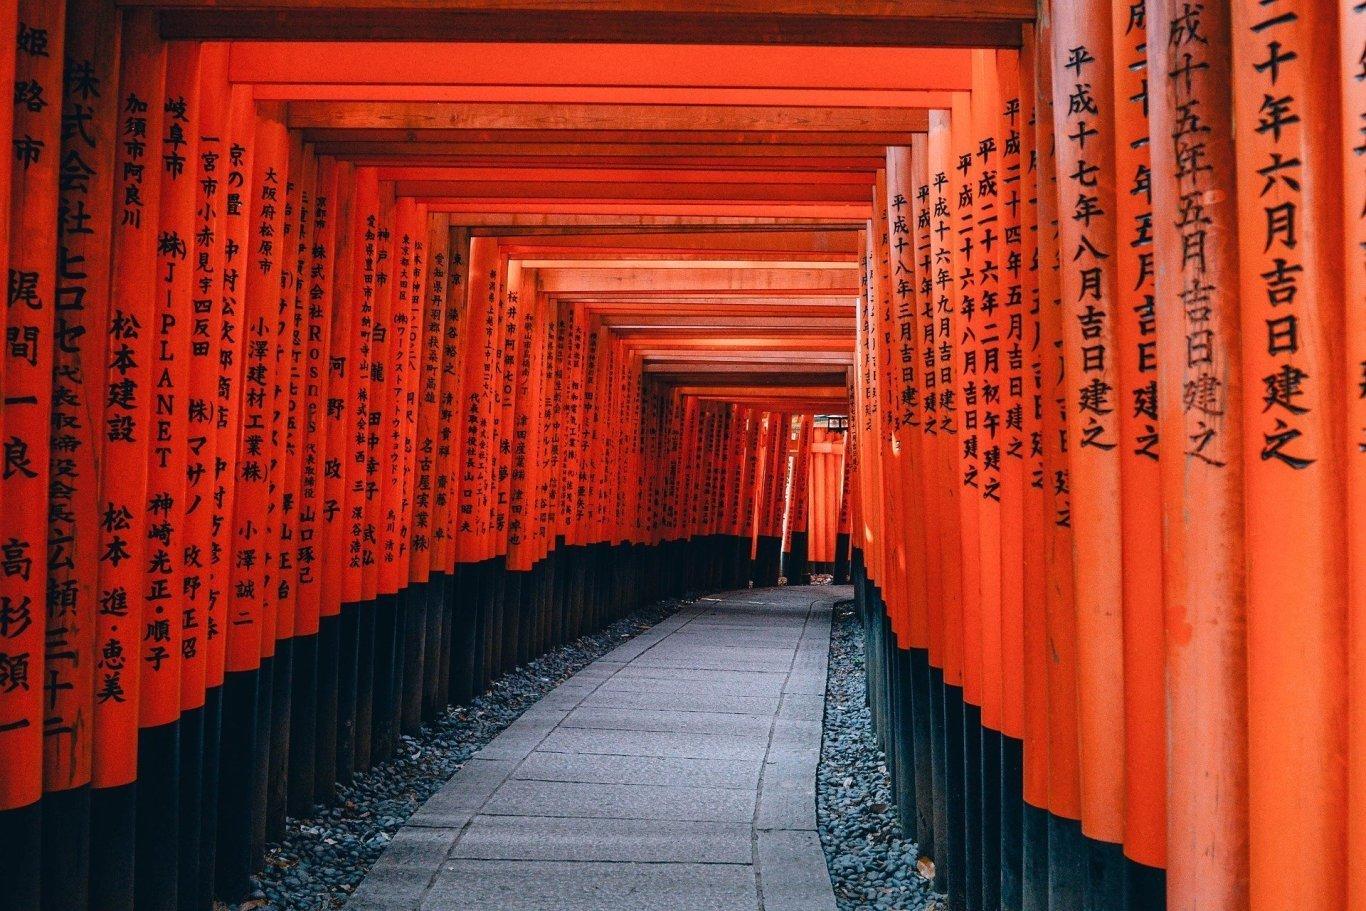 9-Day Luxury Tokyo, Kyoto & Hiroshima - Japan Itinerary